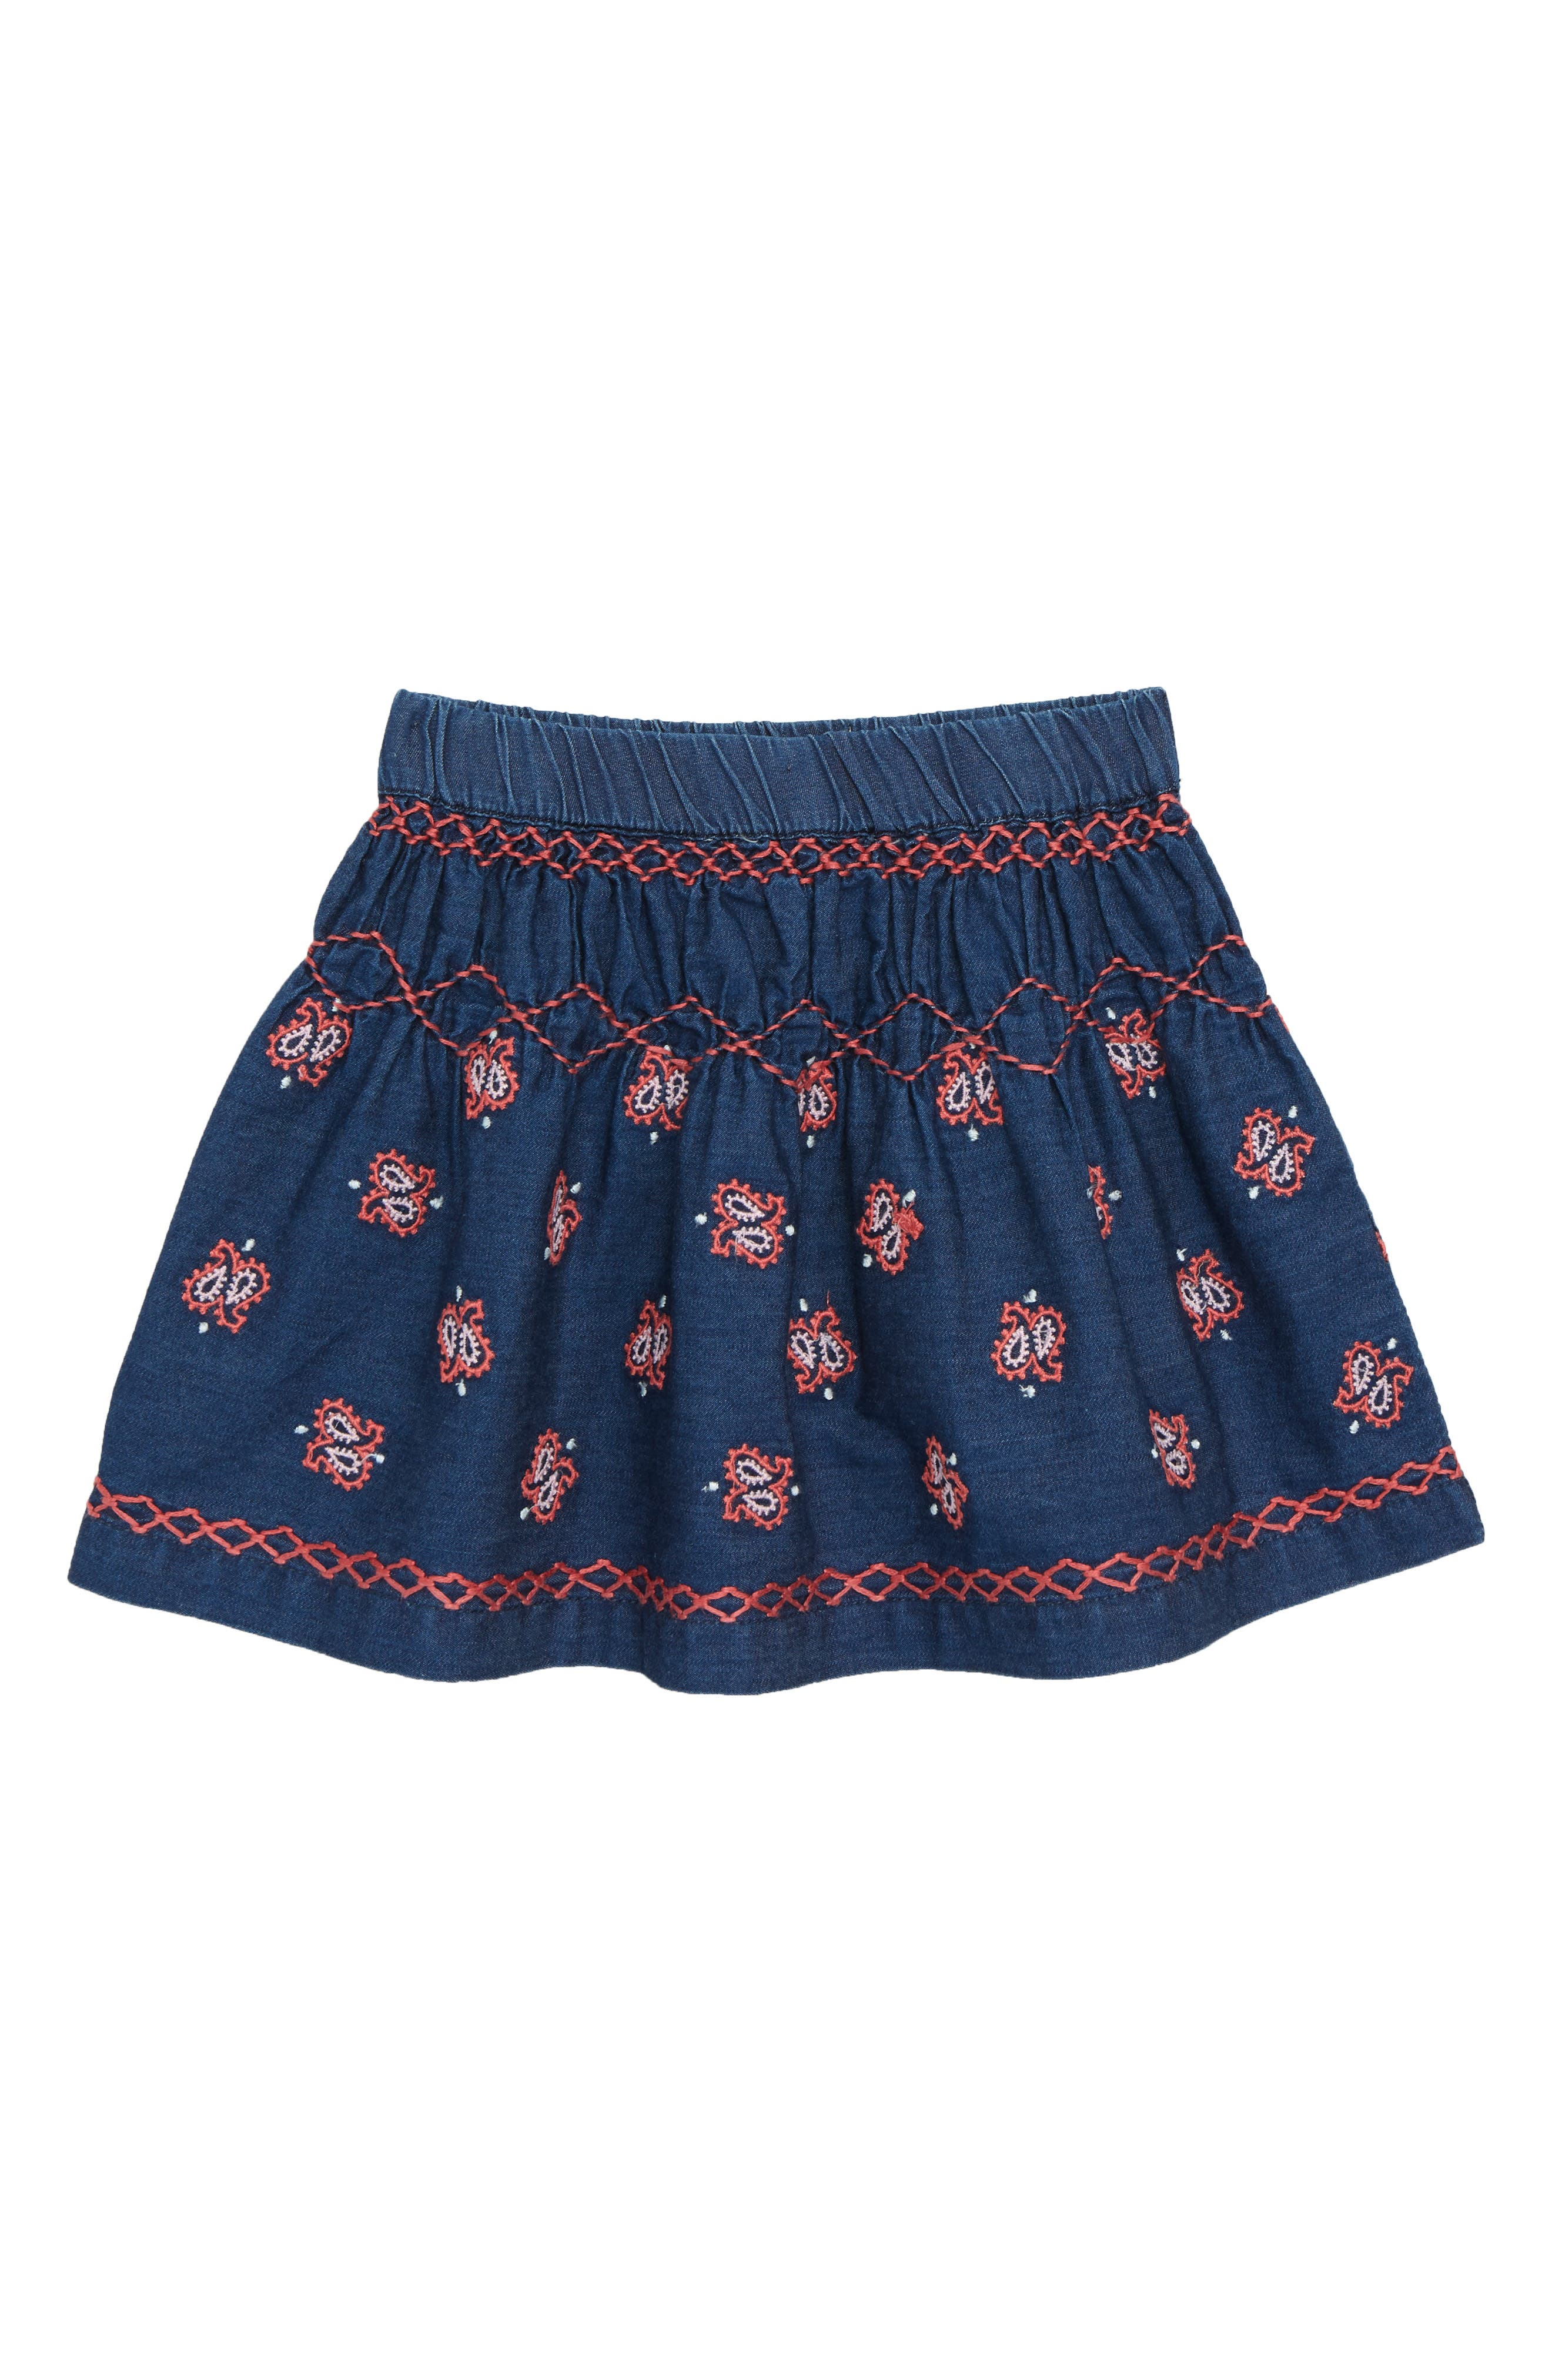 Peek Grace Embroidered Denim Skirt,                             Main thumbnail 1, color,                             402